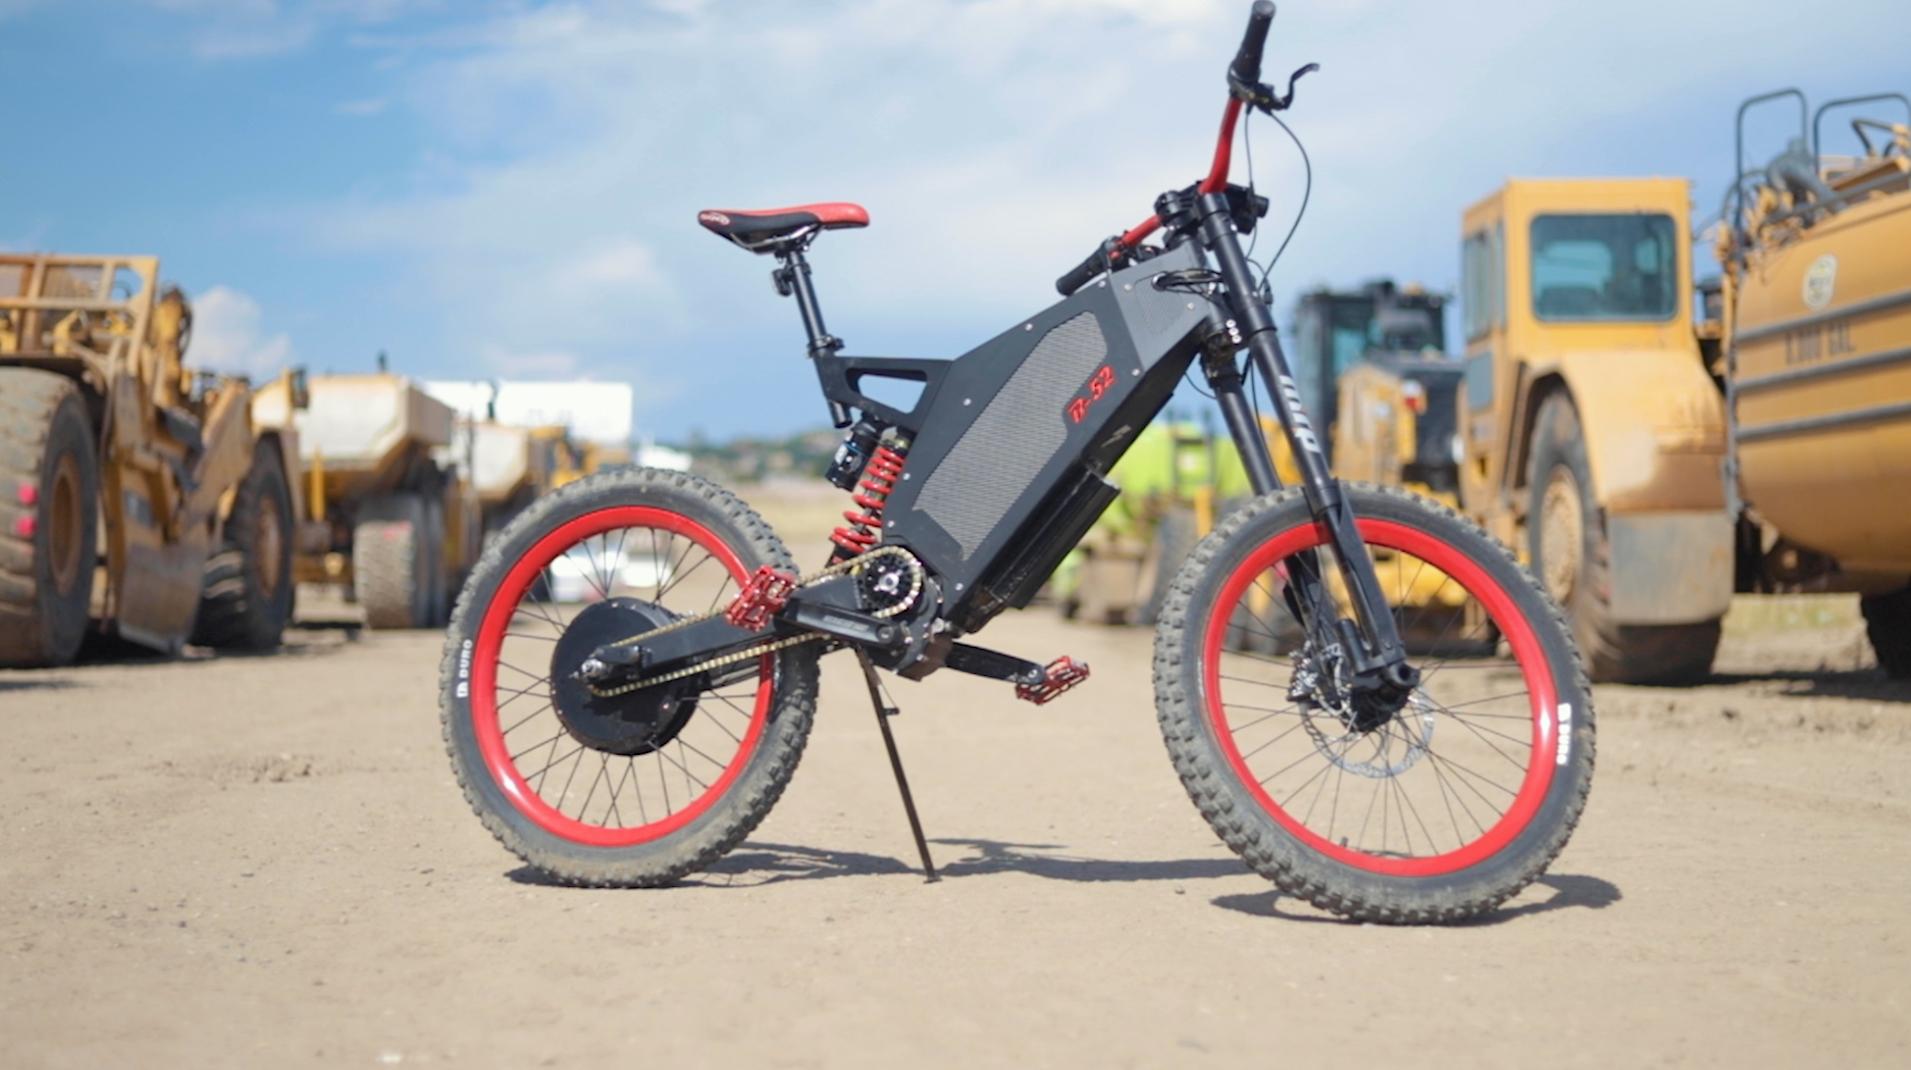 electrified-reviews-stealth-b52-bomber-electric-bike-review-profile-main.jpg